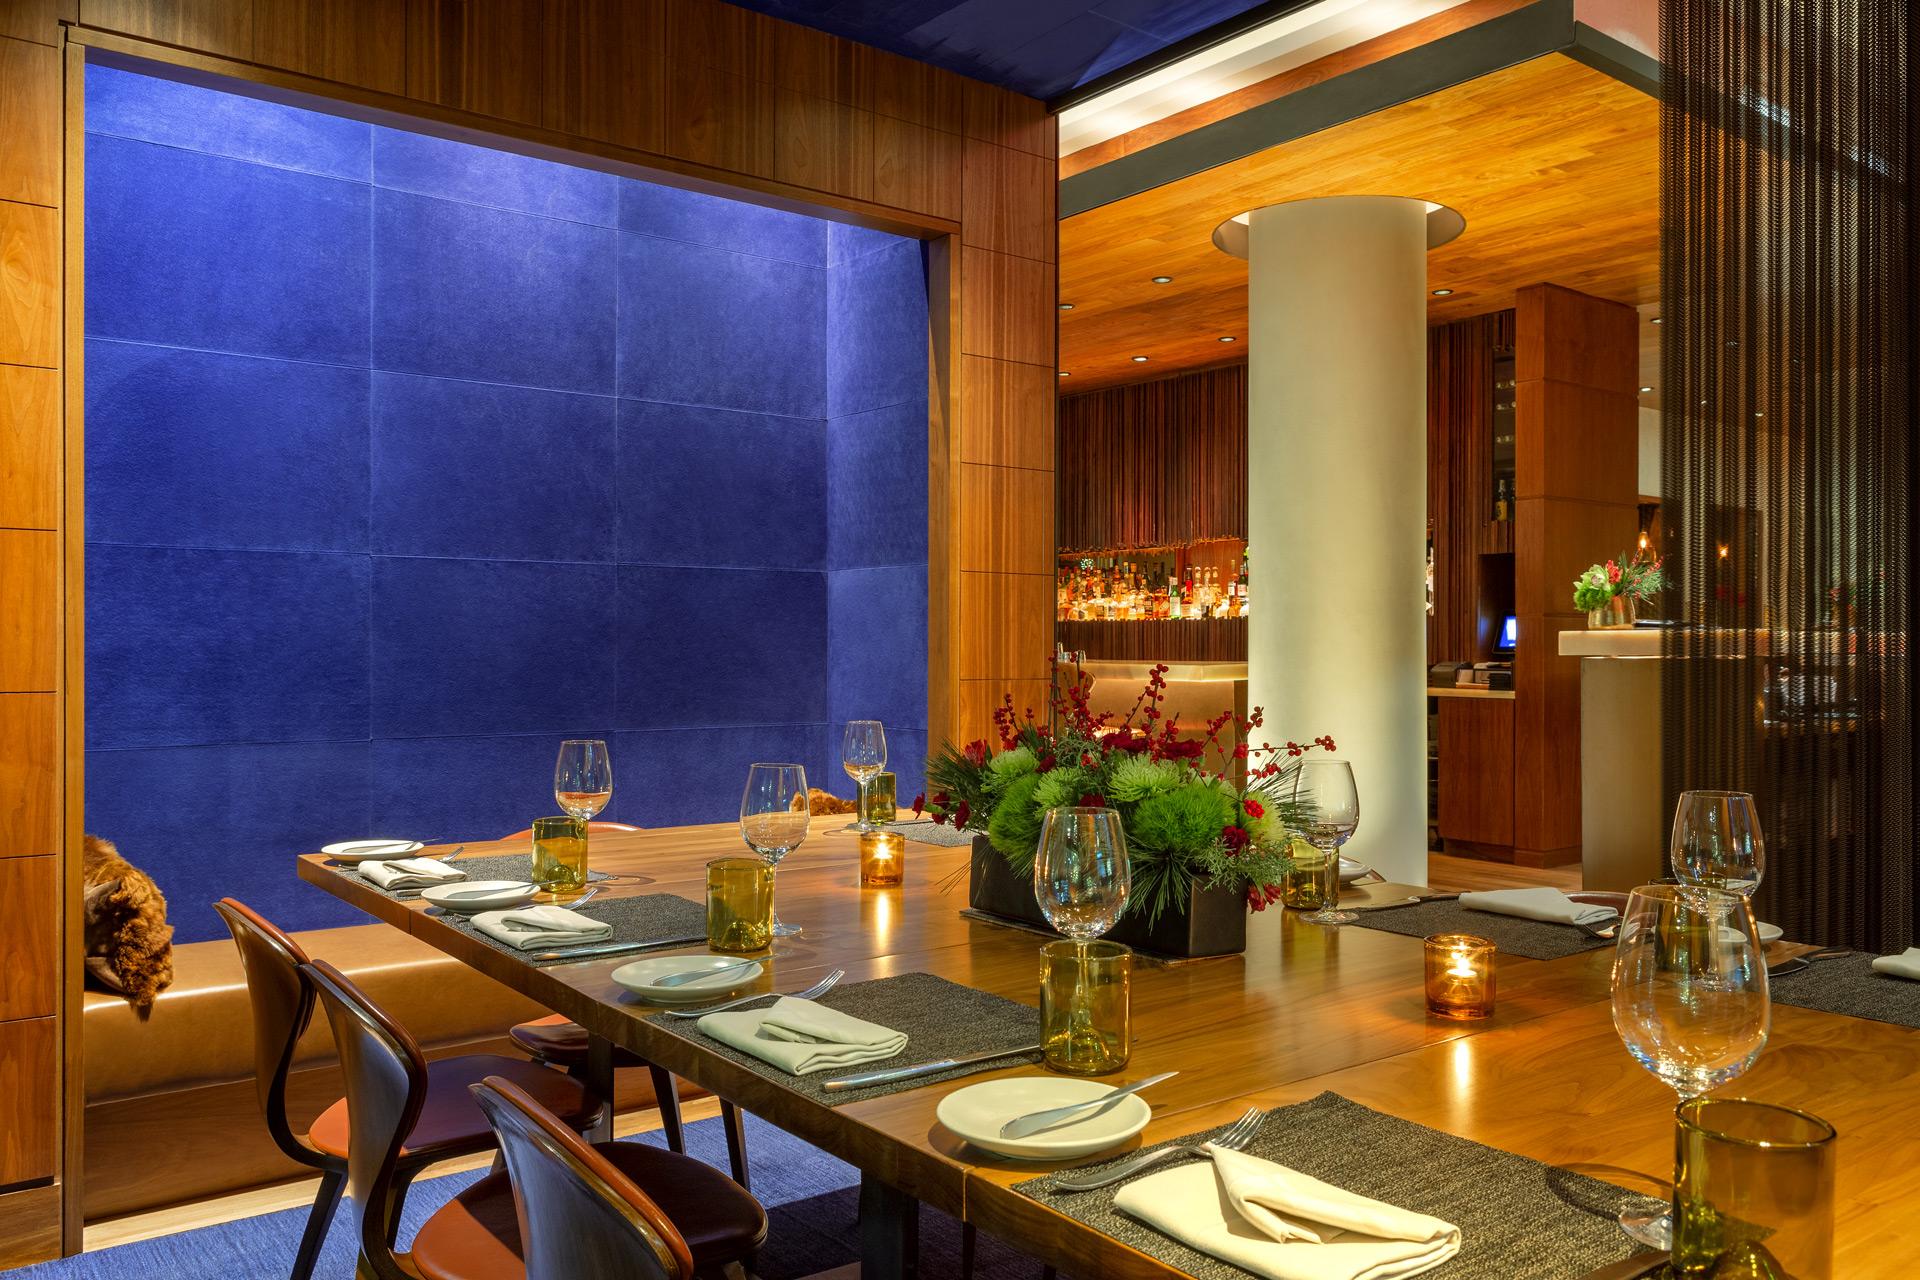 Print Lounge restaurant architecture